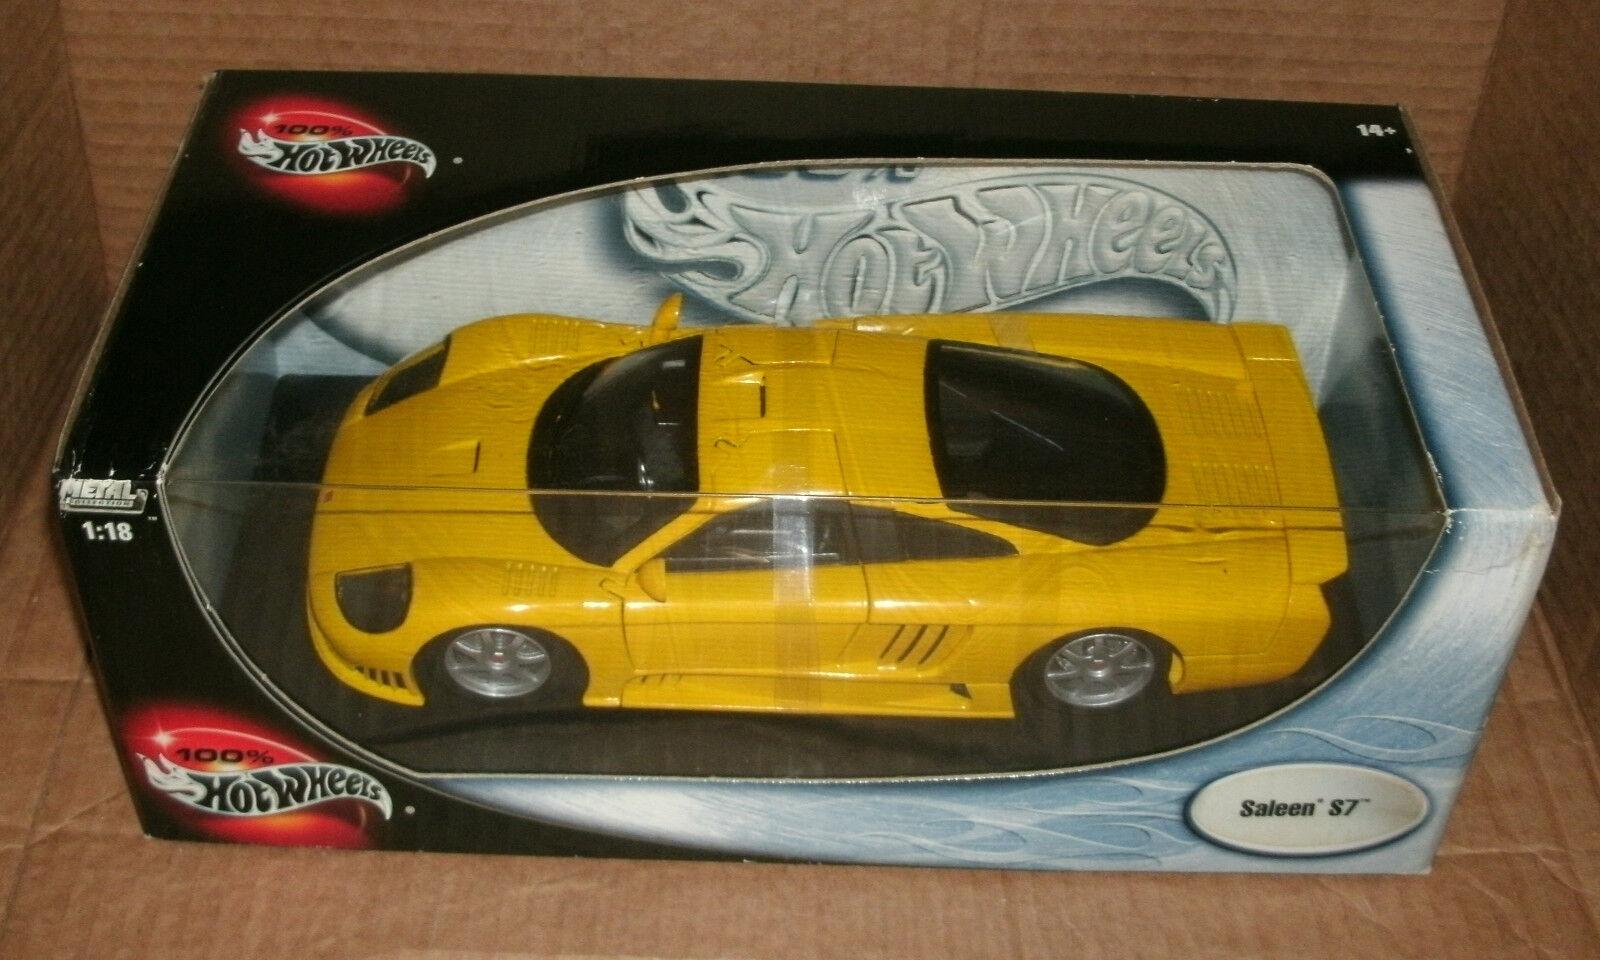 1 18 Scale Scale Scale Saleen S7 Diecast Model Supercar Replica - Hot Wheels 57302 Yellow 129e63